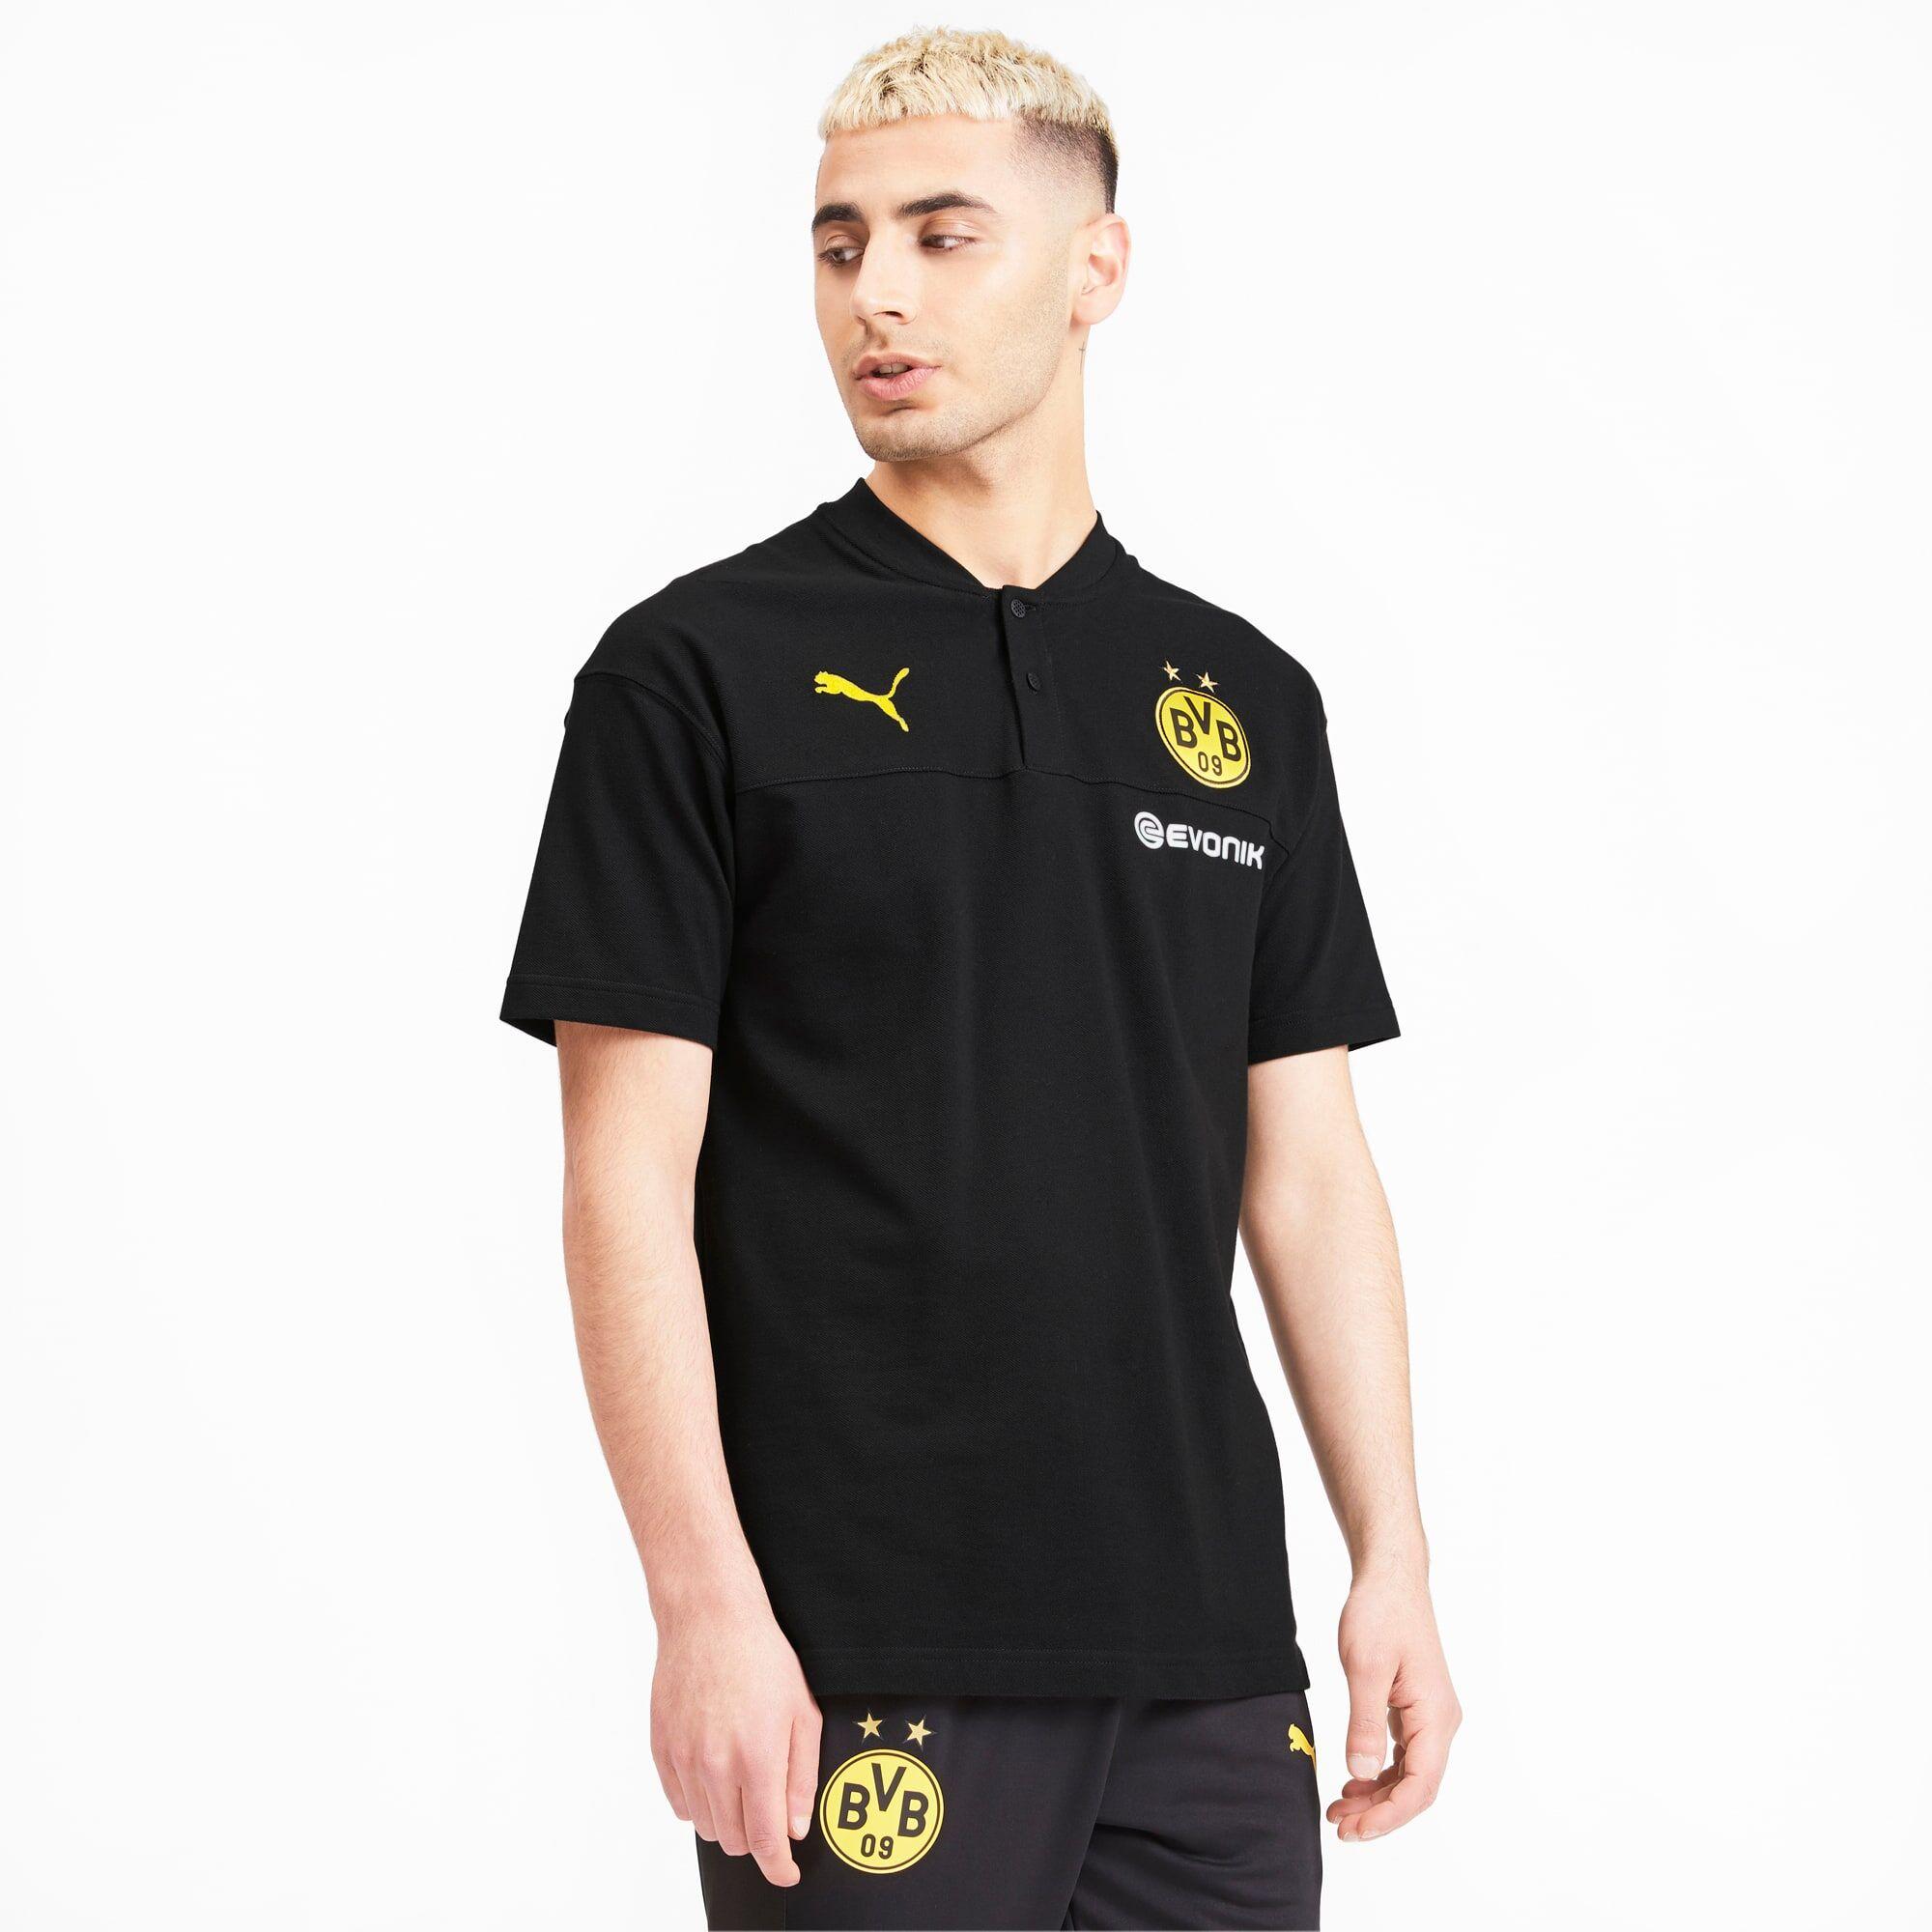 Puma BVB Casuals Men's Polo Shirt,  Black/Phantom Black, size Medium, Clothing